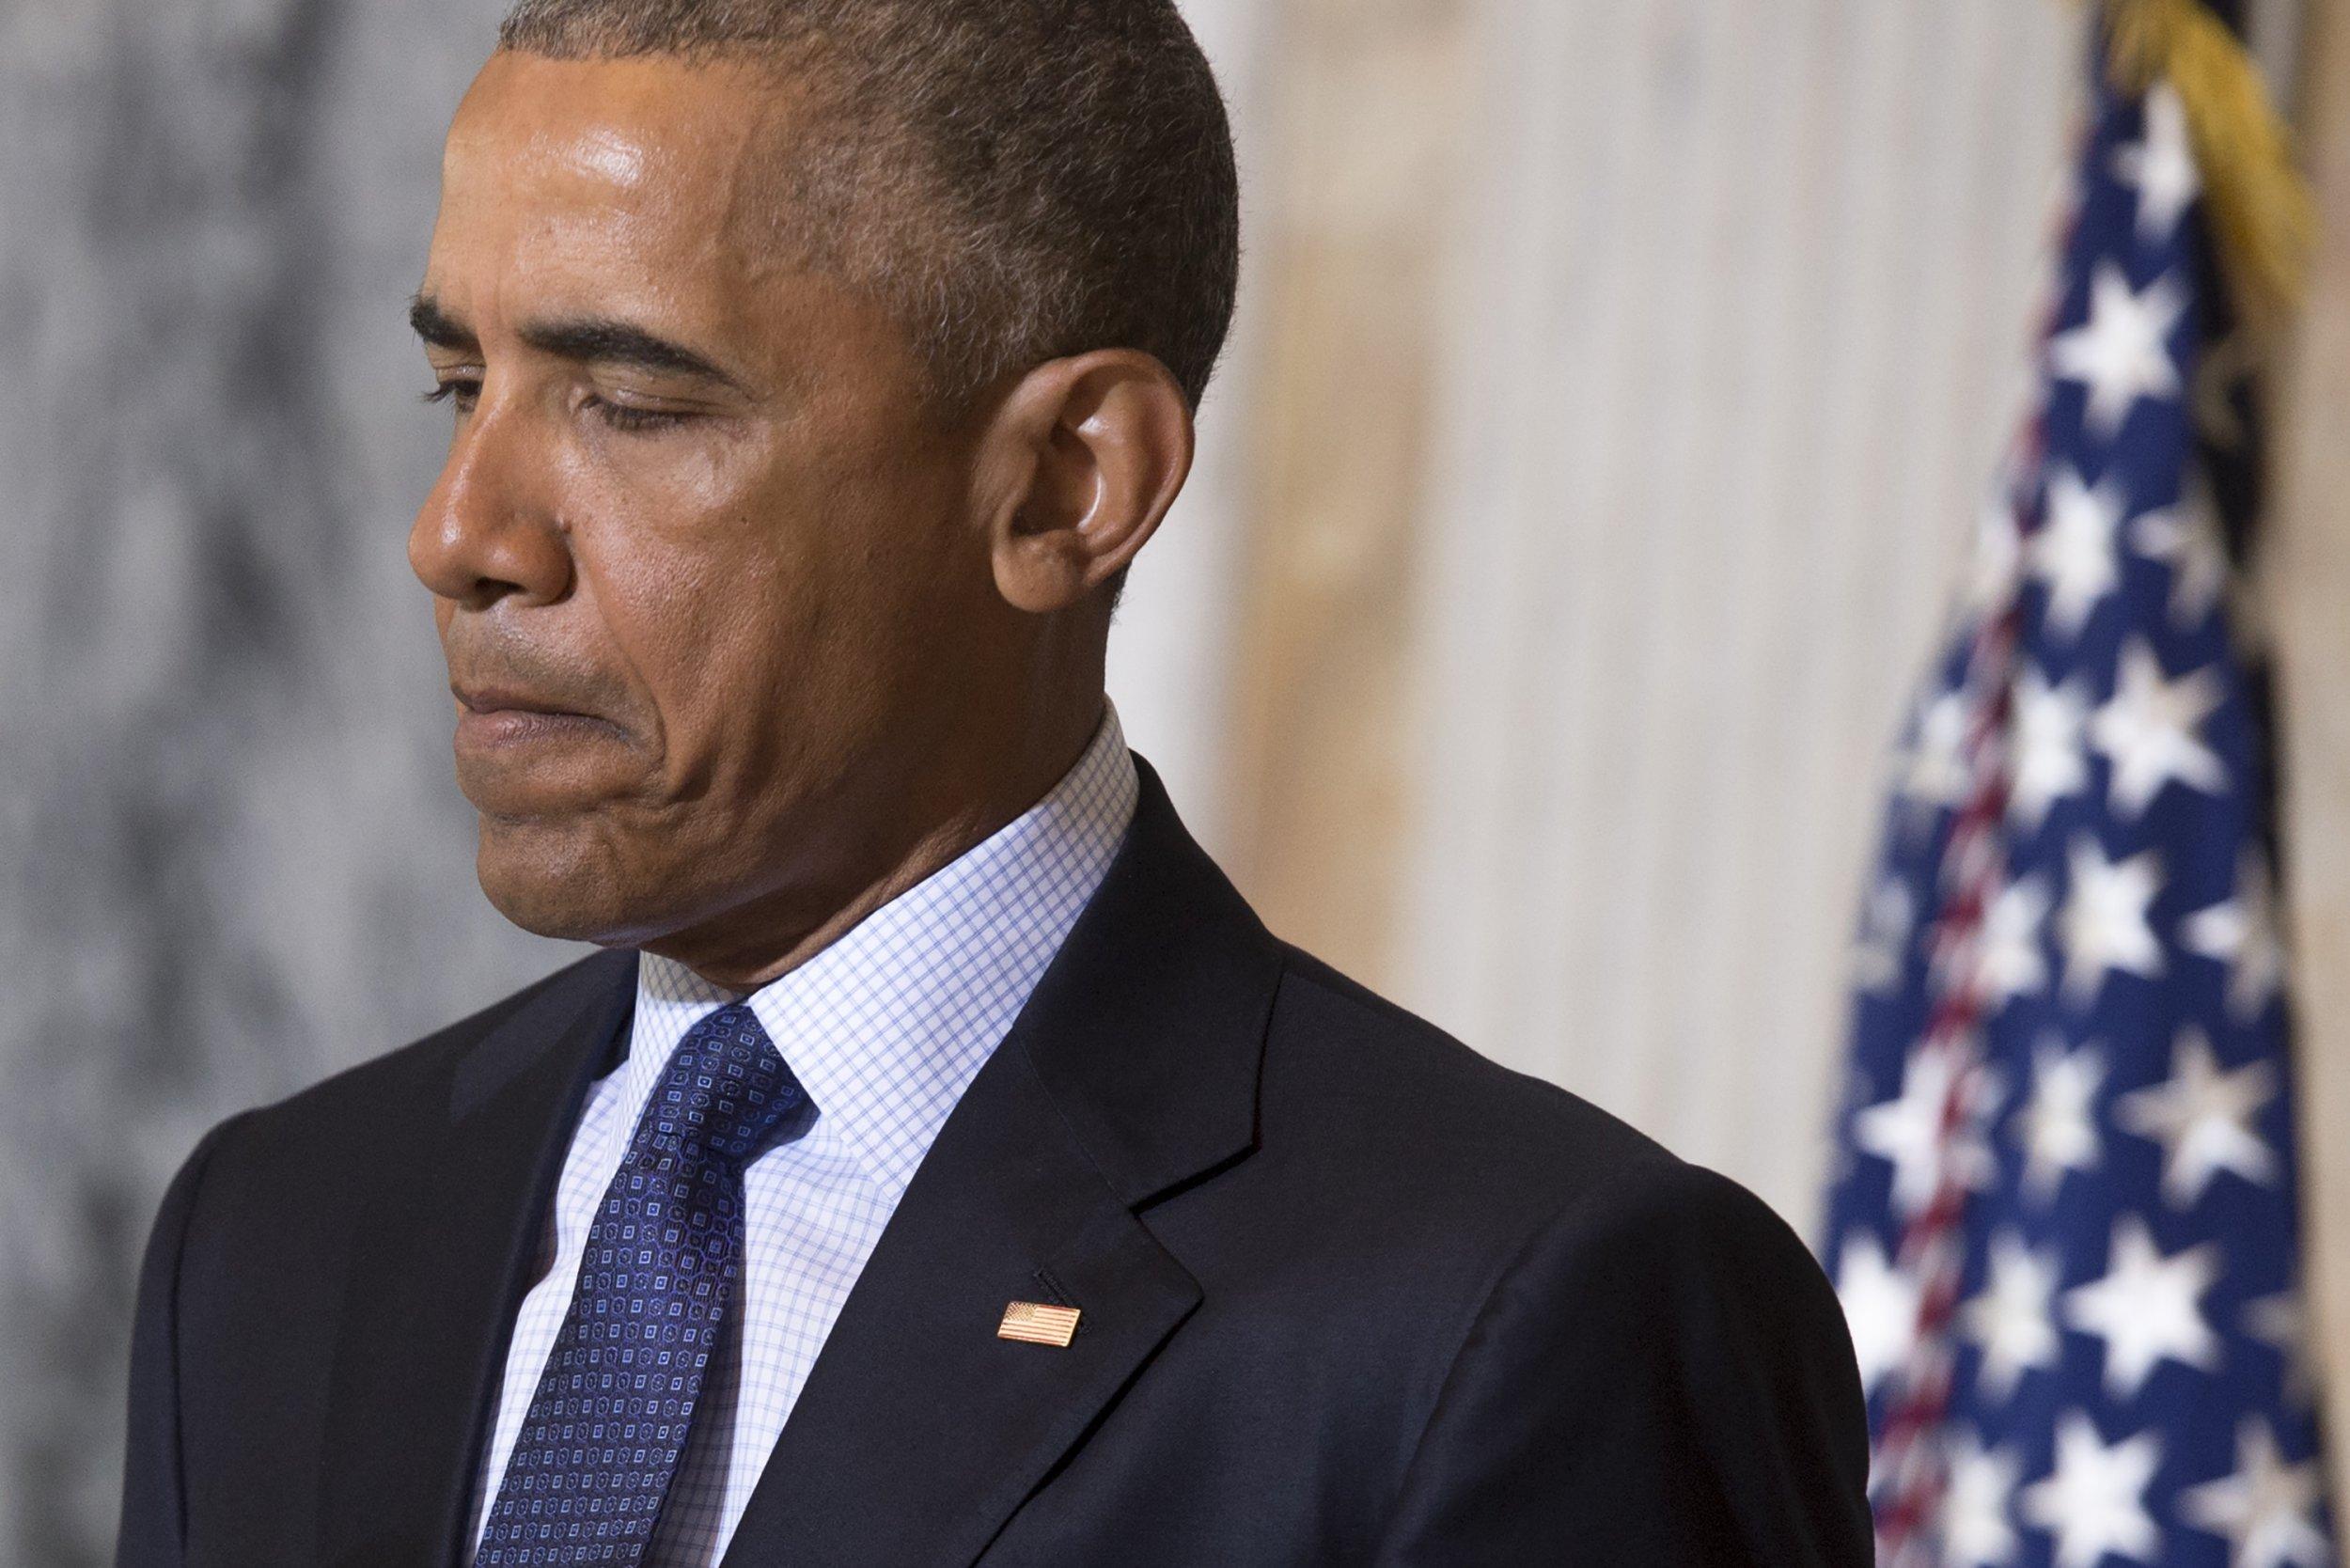 Obama speaks after ISIS meeting